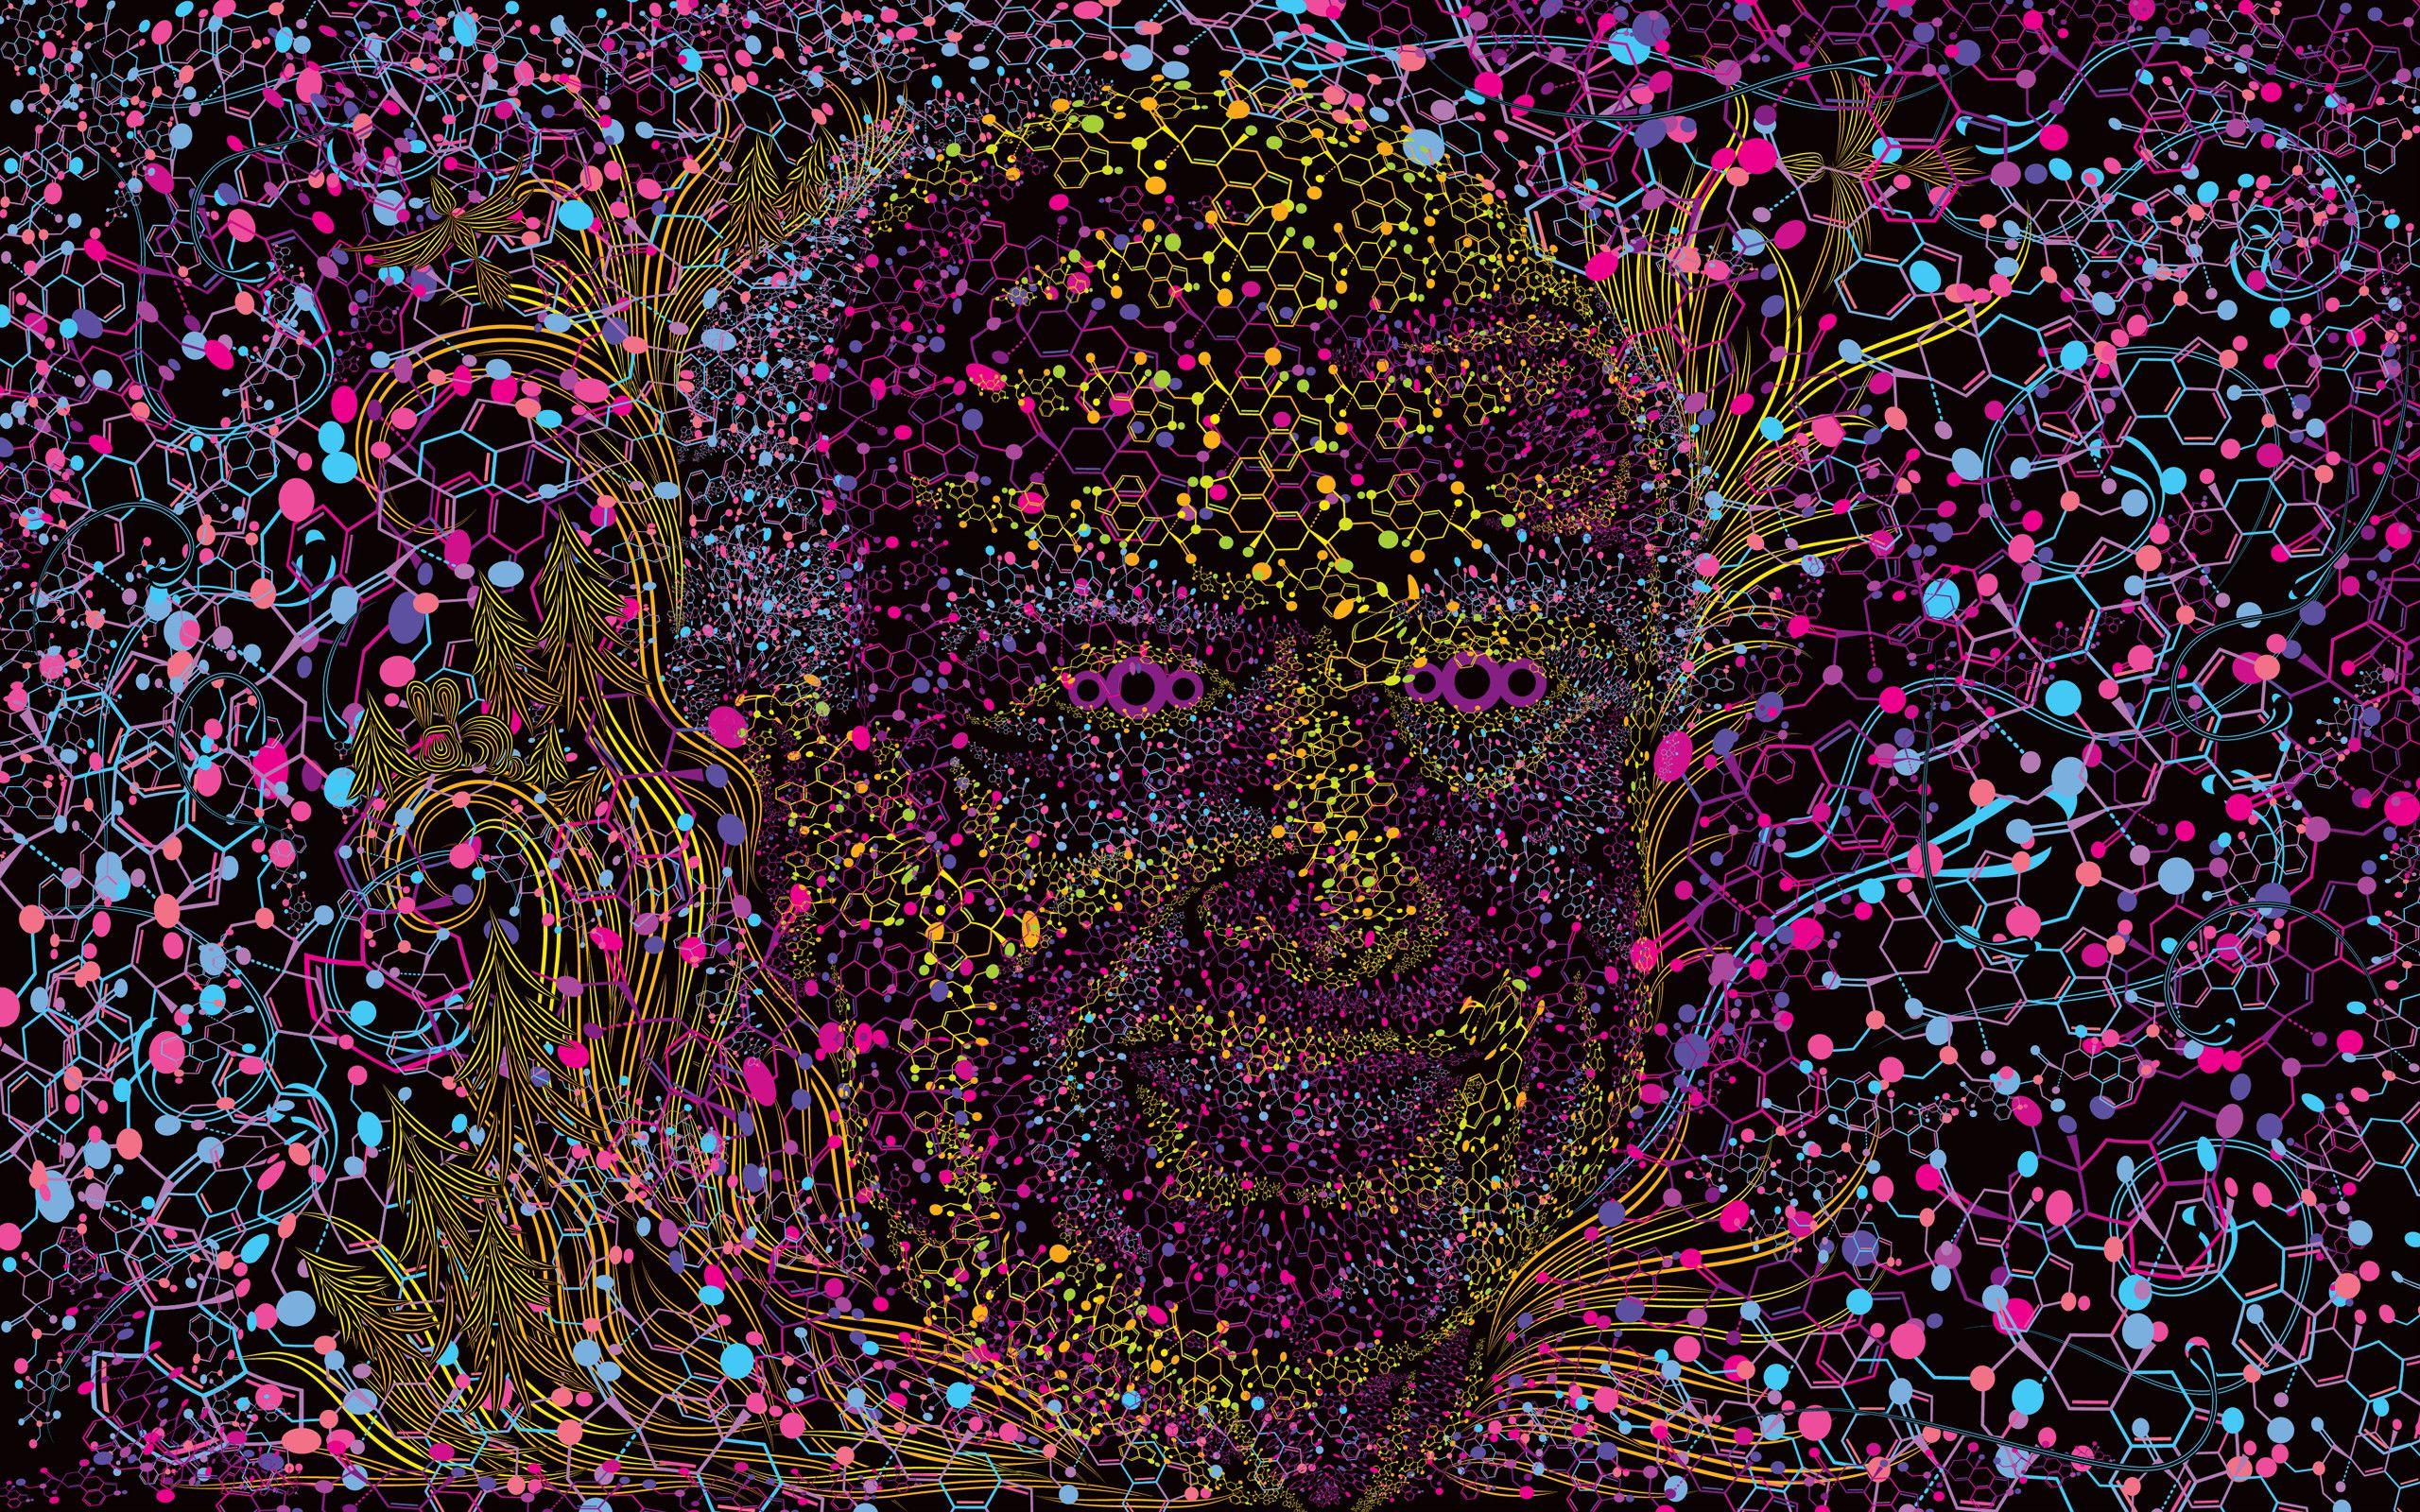 Res 2560x1600 Albert Hofmann Psychedelic Portrait Free Wallpaper Trippy Tapestry Psychedelic Psychedelic Experience